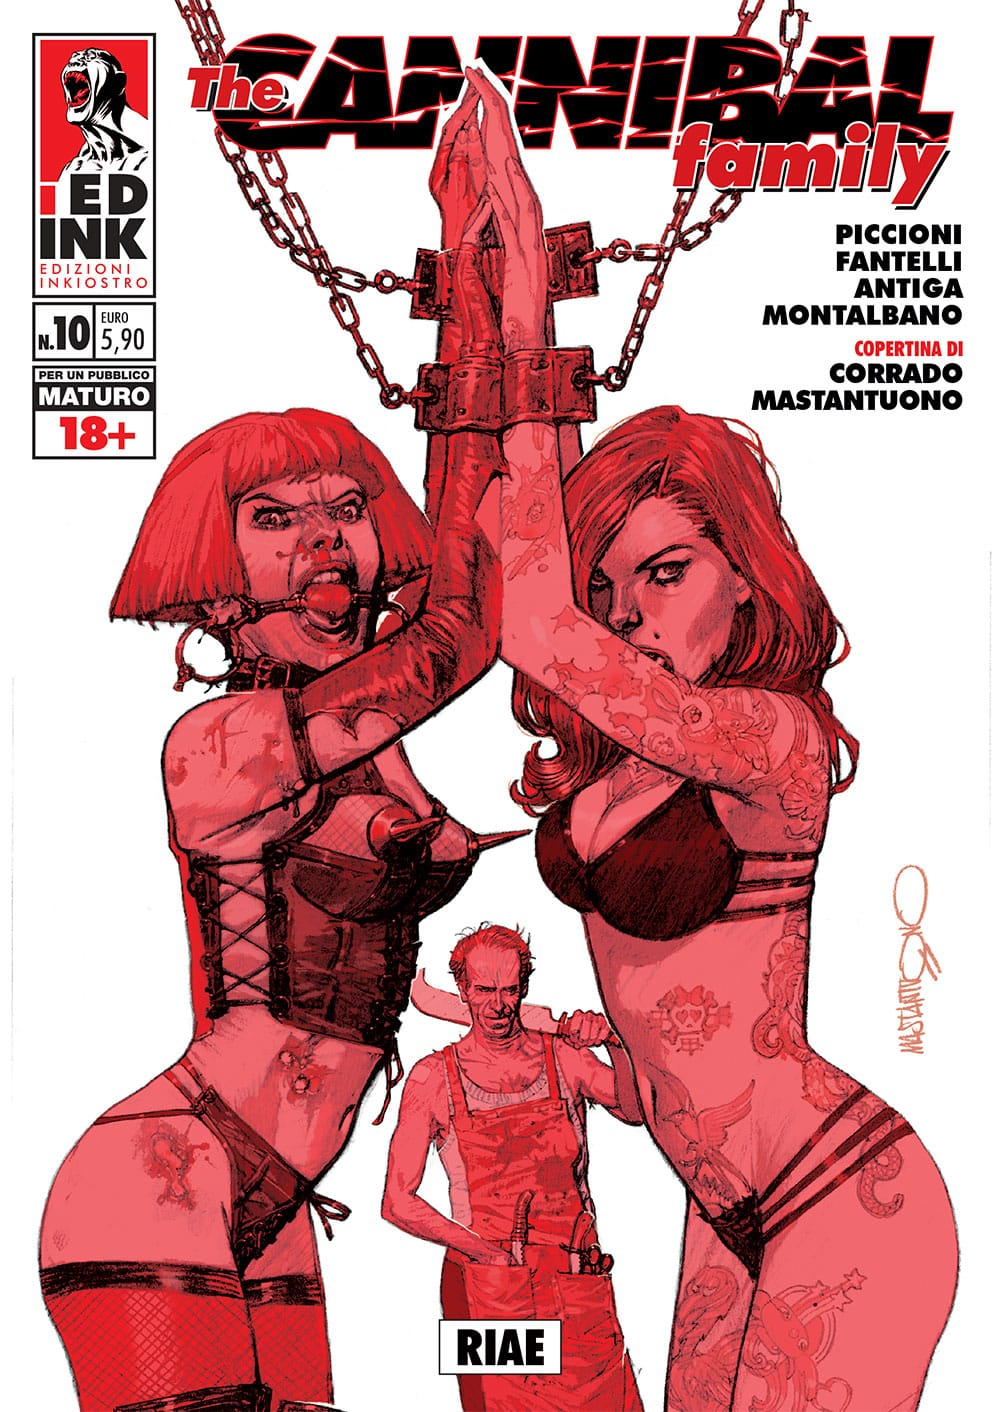 The-Cannibal-Family-10-copertina-BIANCA_Notizie